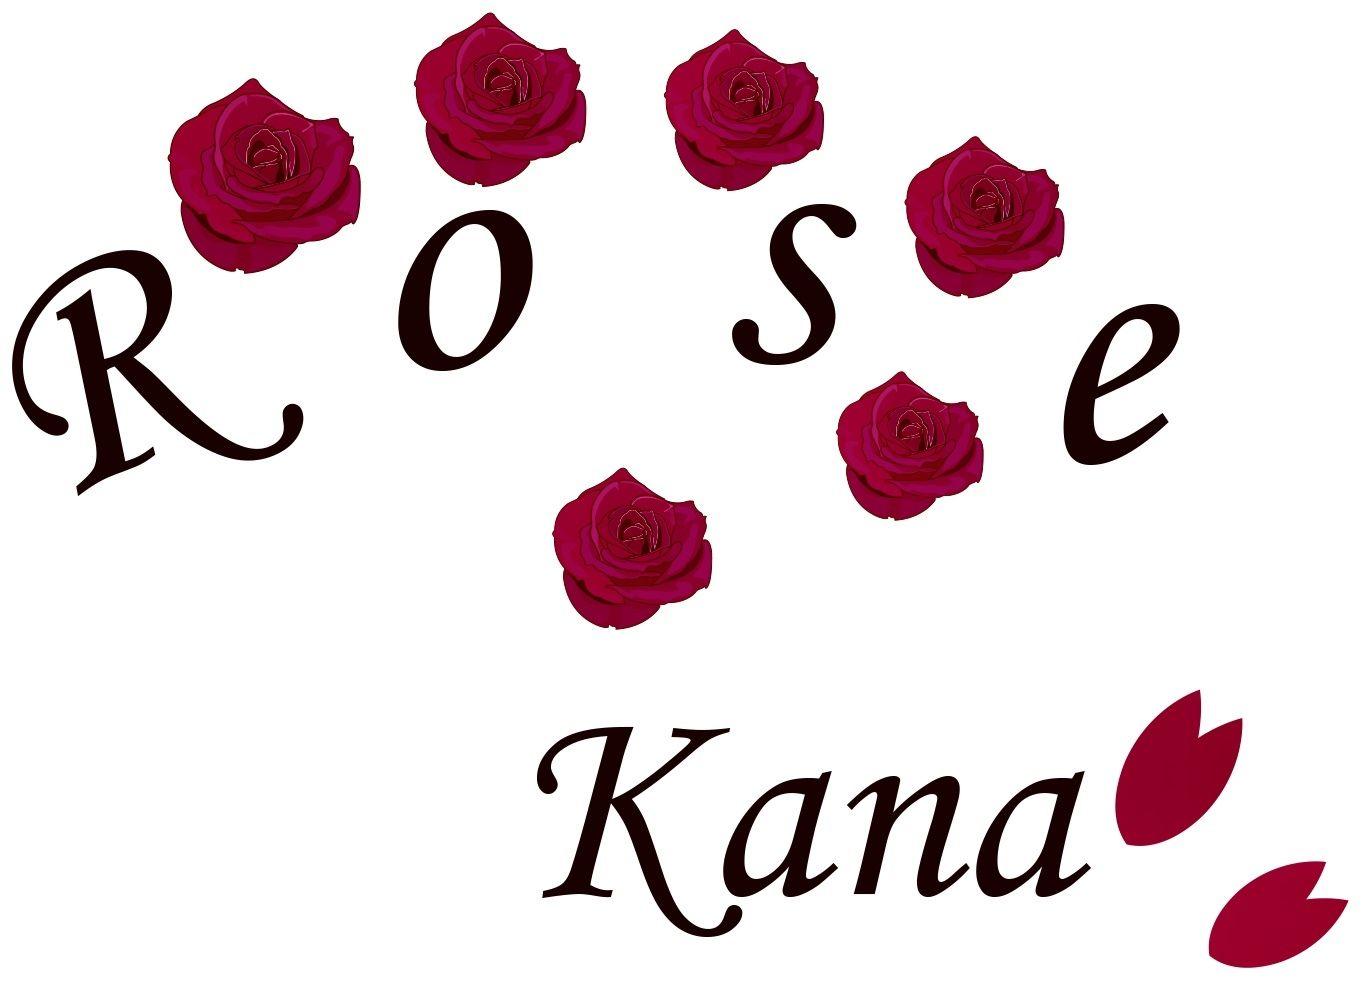 Rose Kana